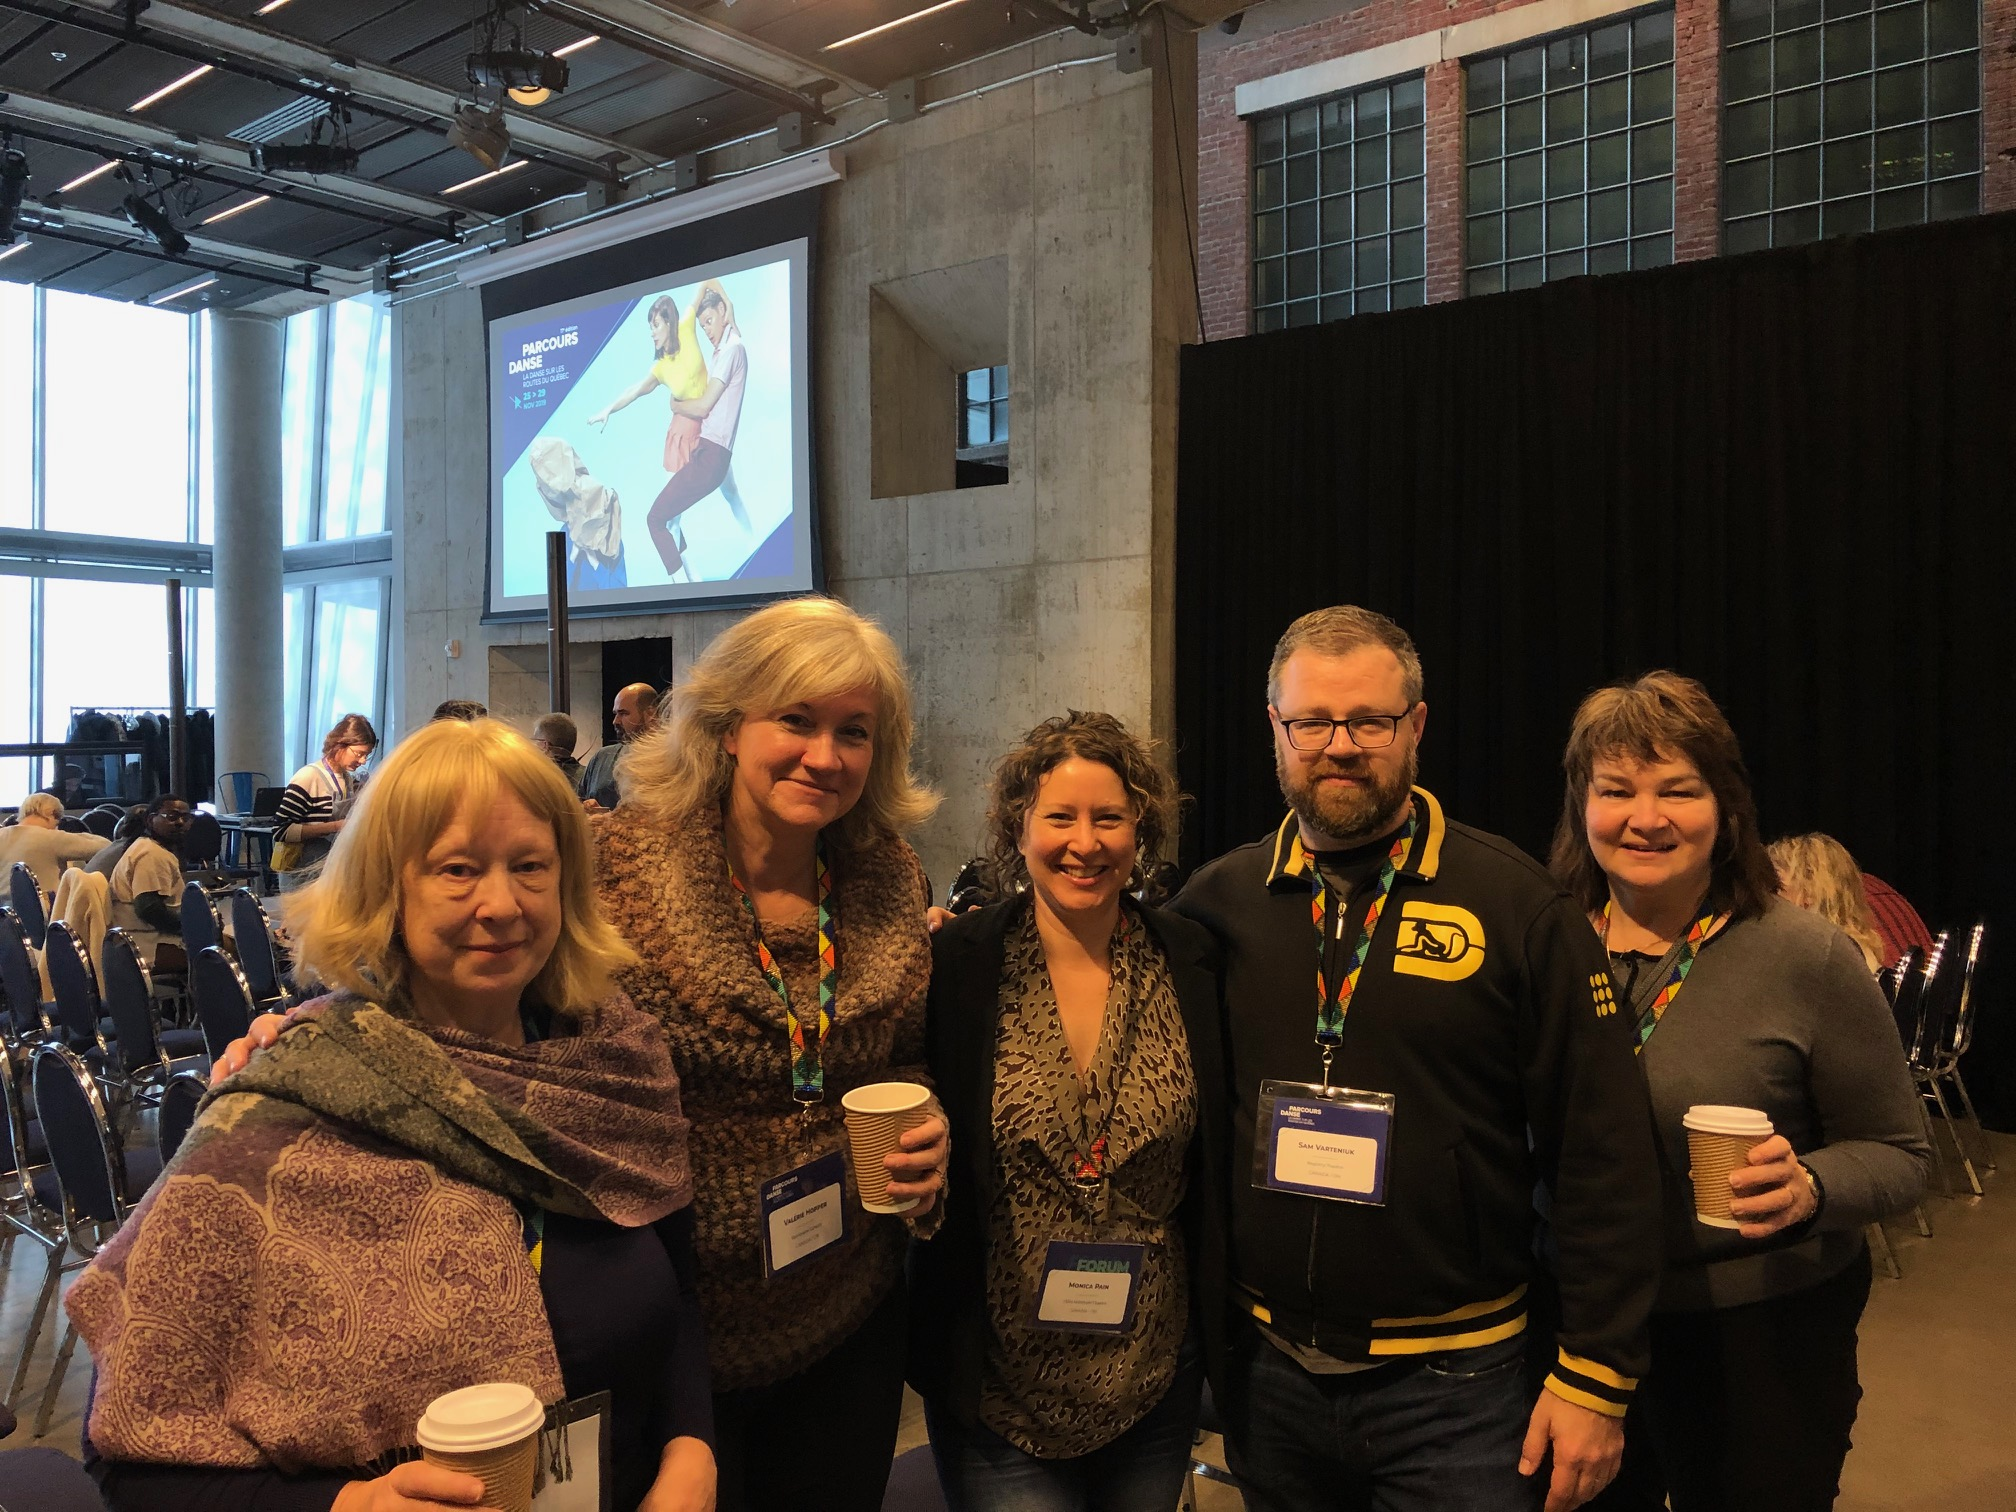 Judy Harquail, Valerie Hopper, Monica Pain, Sam Varteniuk, and Helen Studholme at Parcours Danse